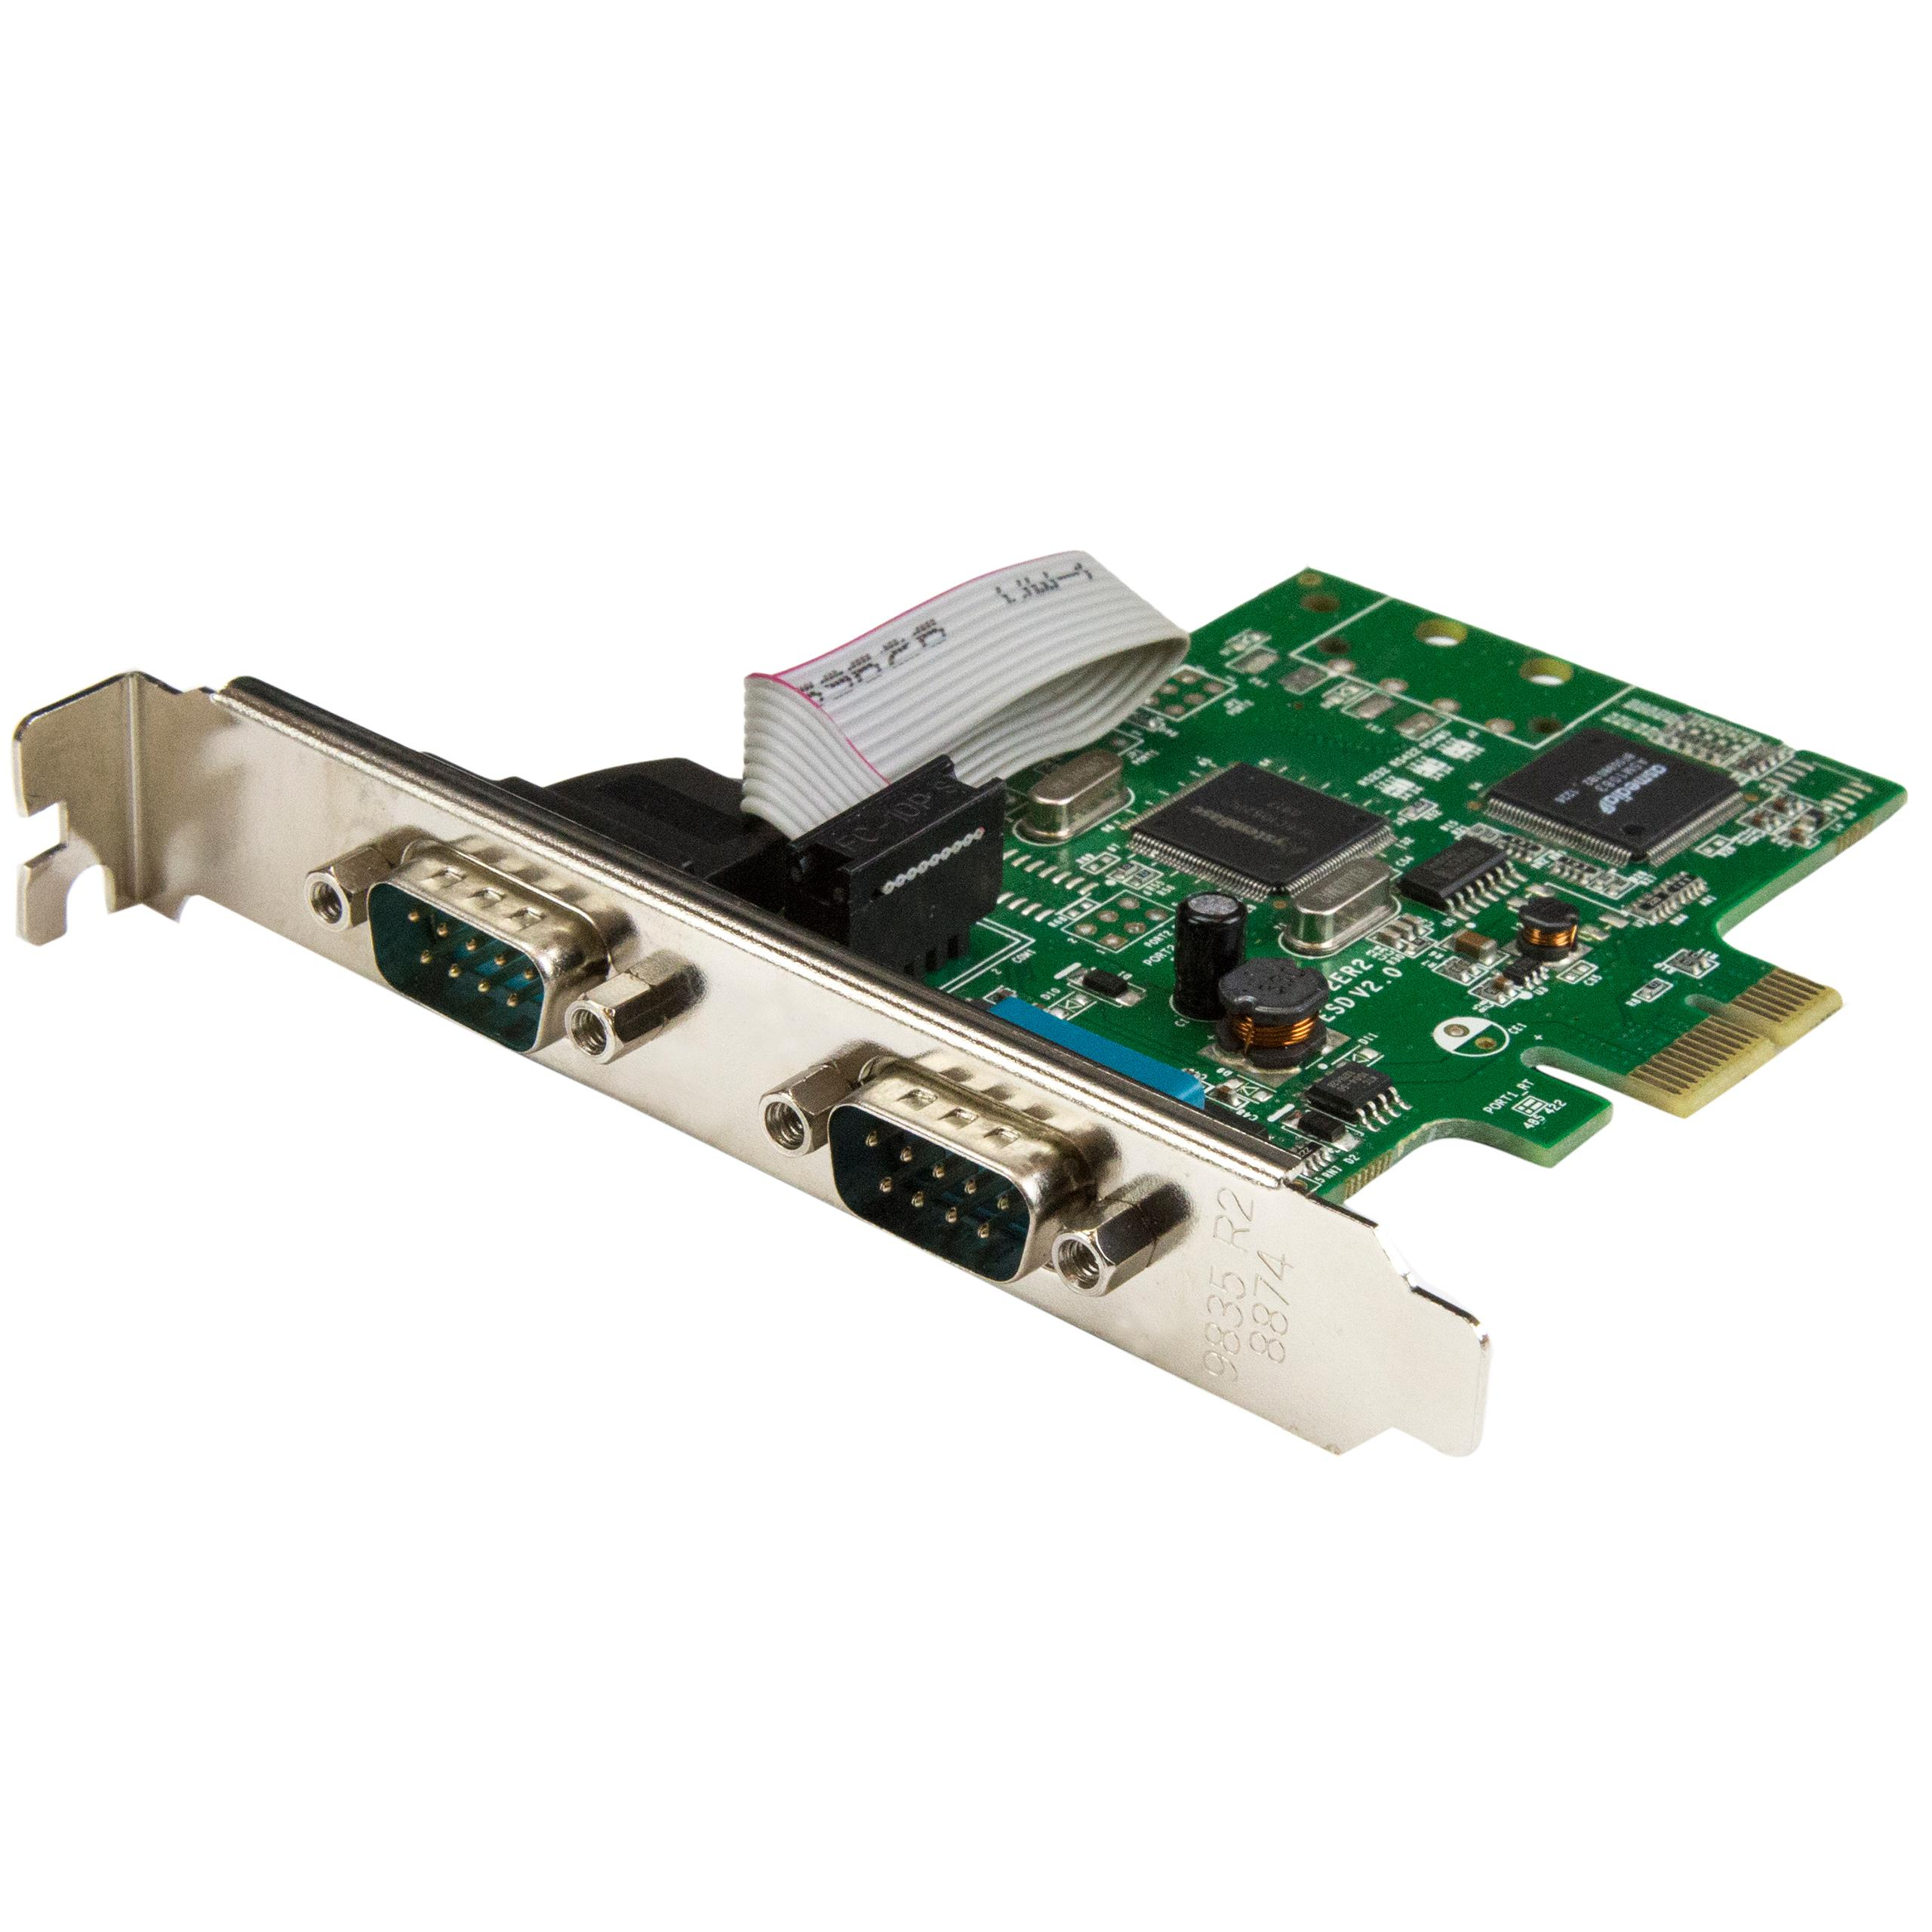 StarTech com PCI Express Serial Card - 2 Port - Dual Channel 16C1050 UART -  Serial Port PCIe Card - Serial Expansion Card